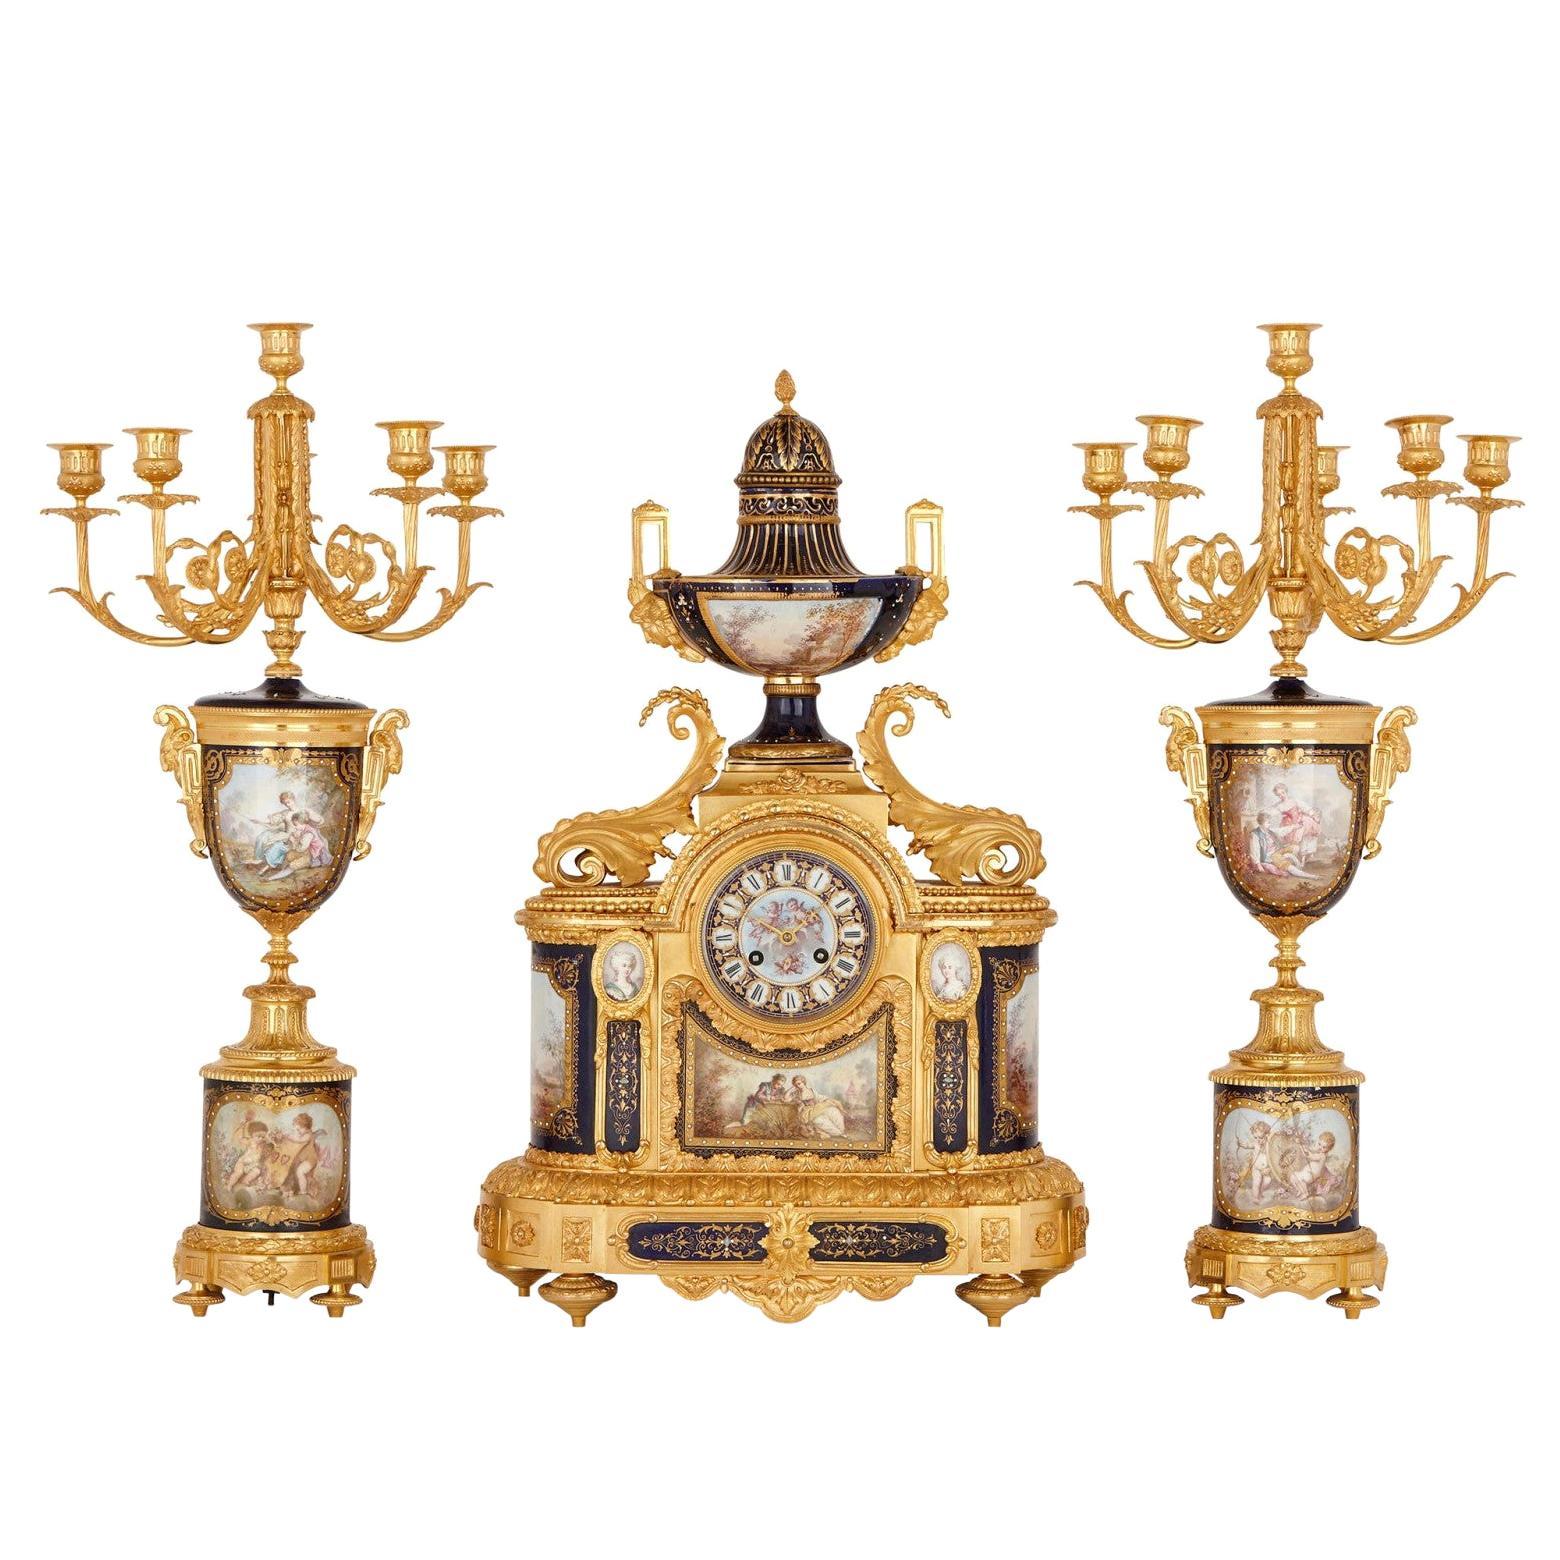 Fine Quality 19th Century Sevres Style Clock Garniture